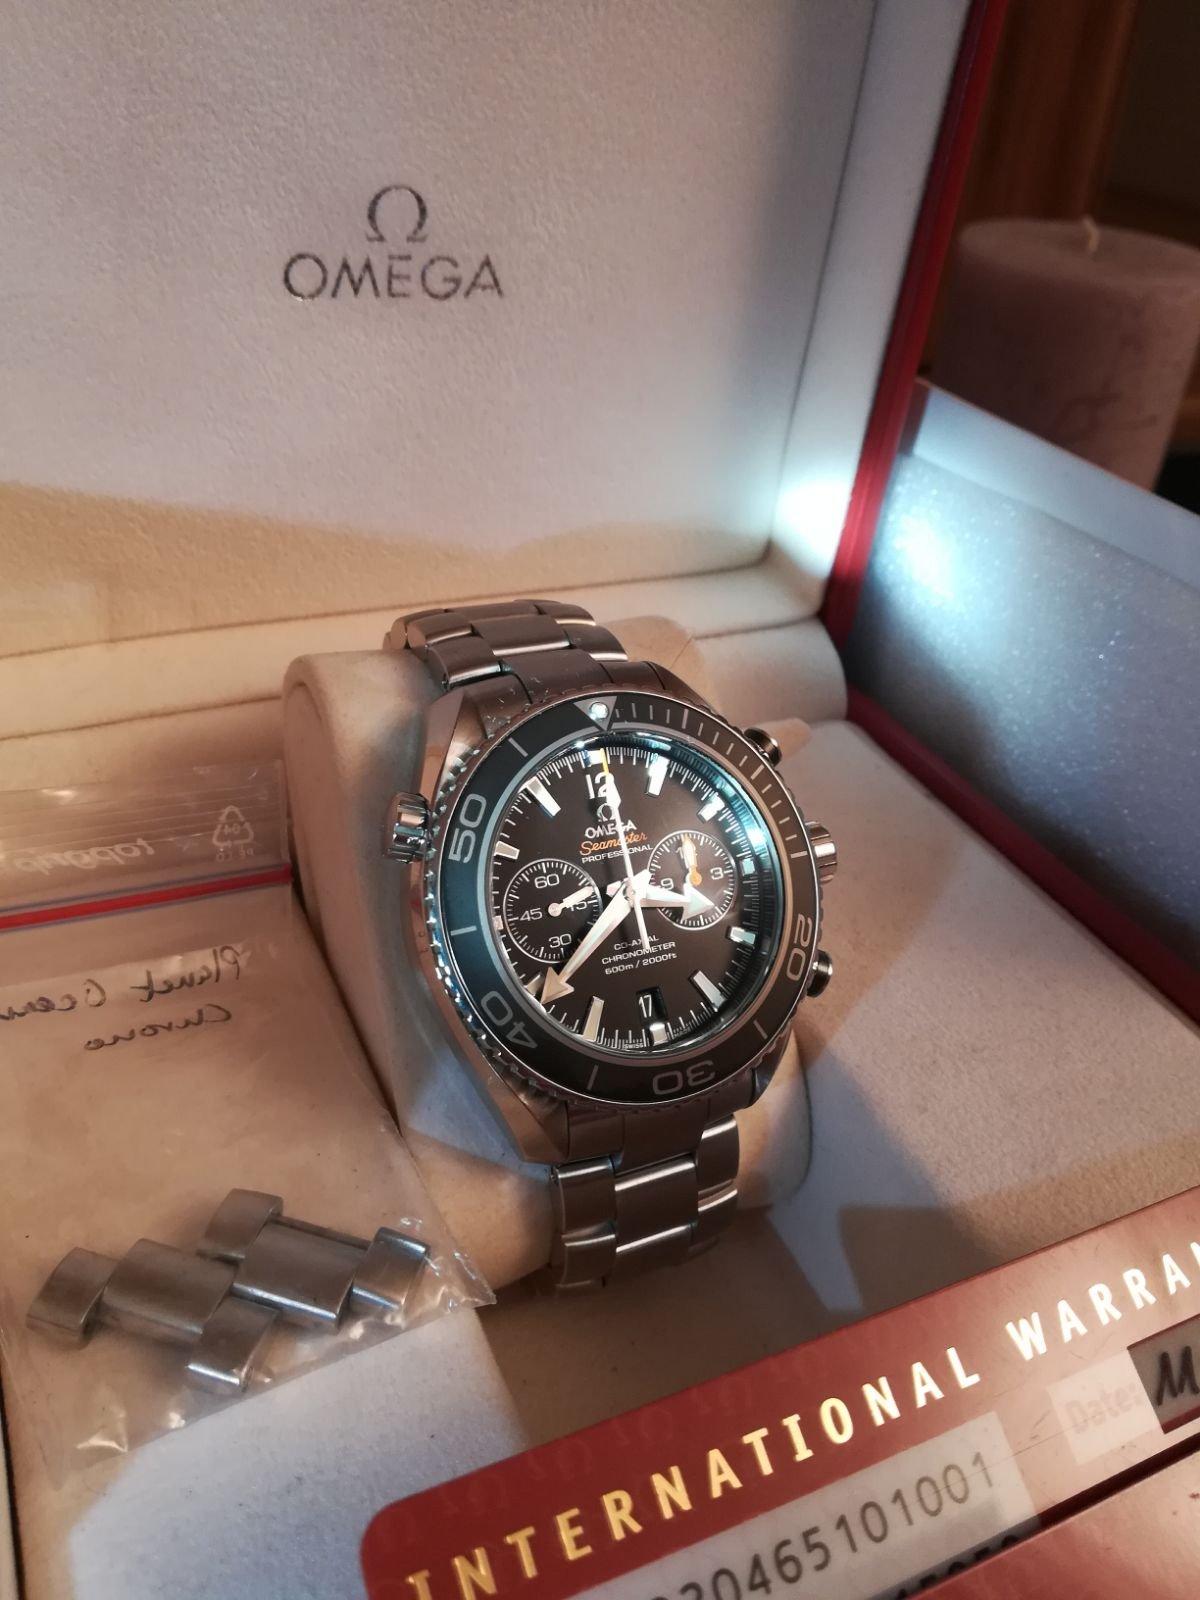 Eladó Omega OMEGA De Ville Prestige Automata Férfi Óra c9900b3f74